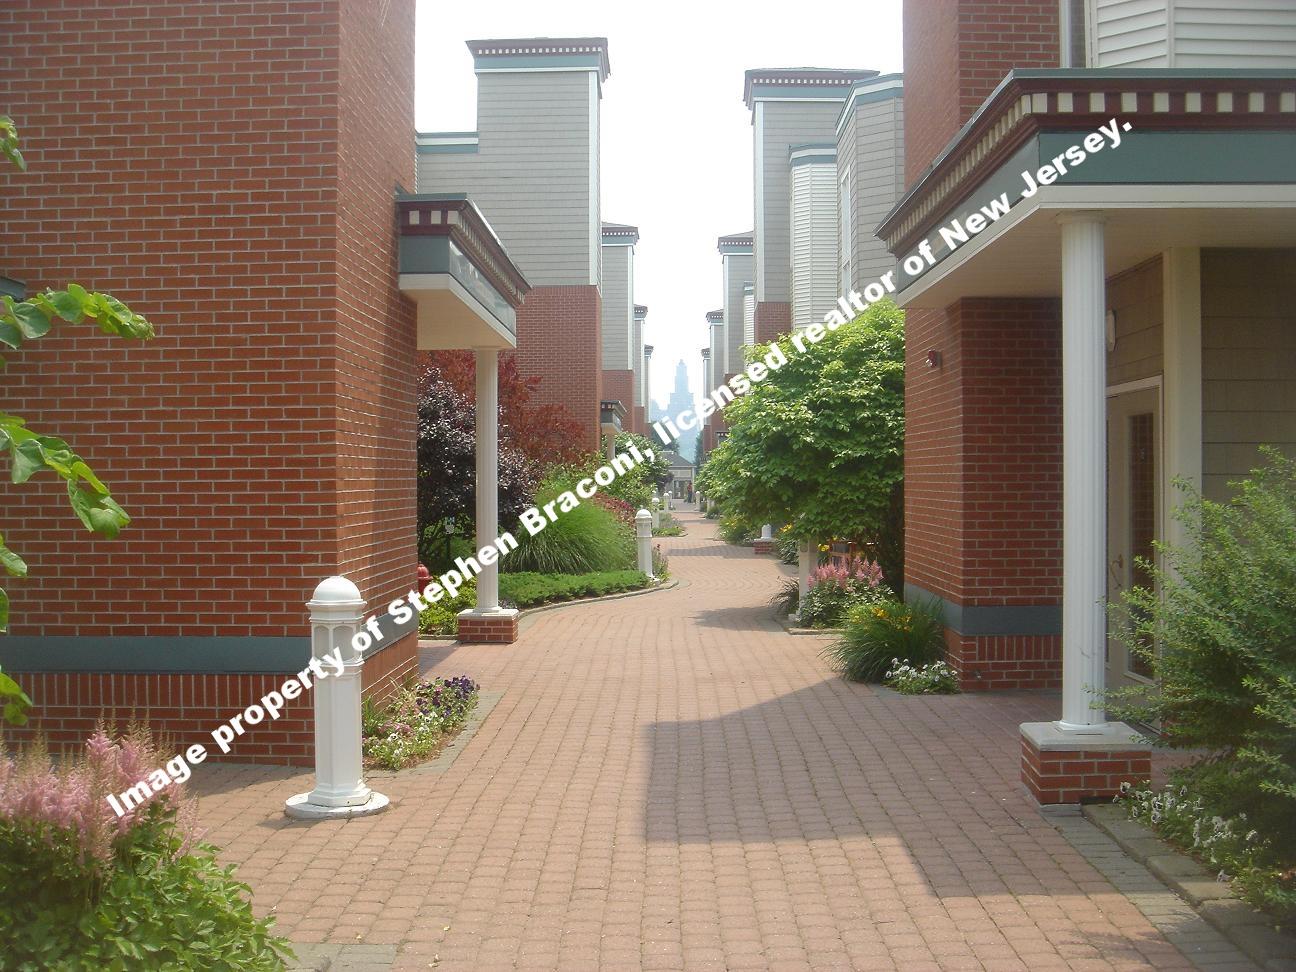 The Promenade Edgewater NJ